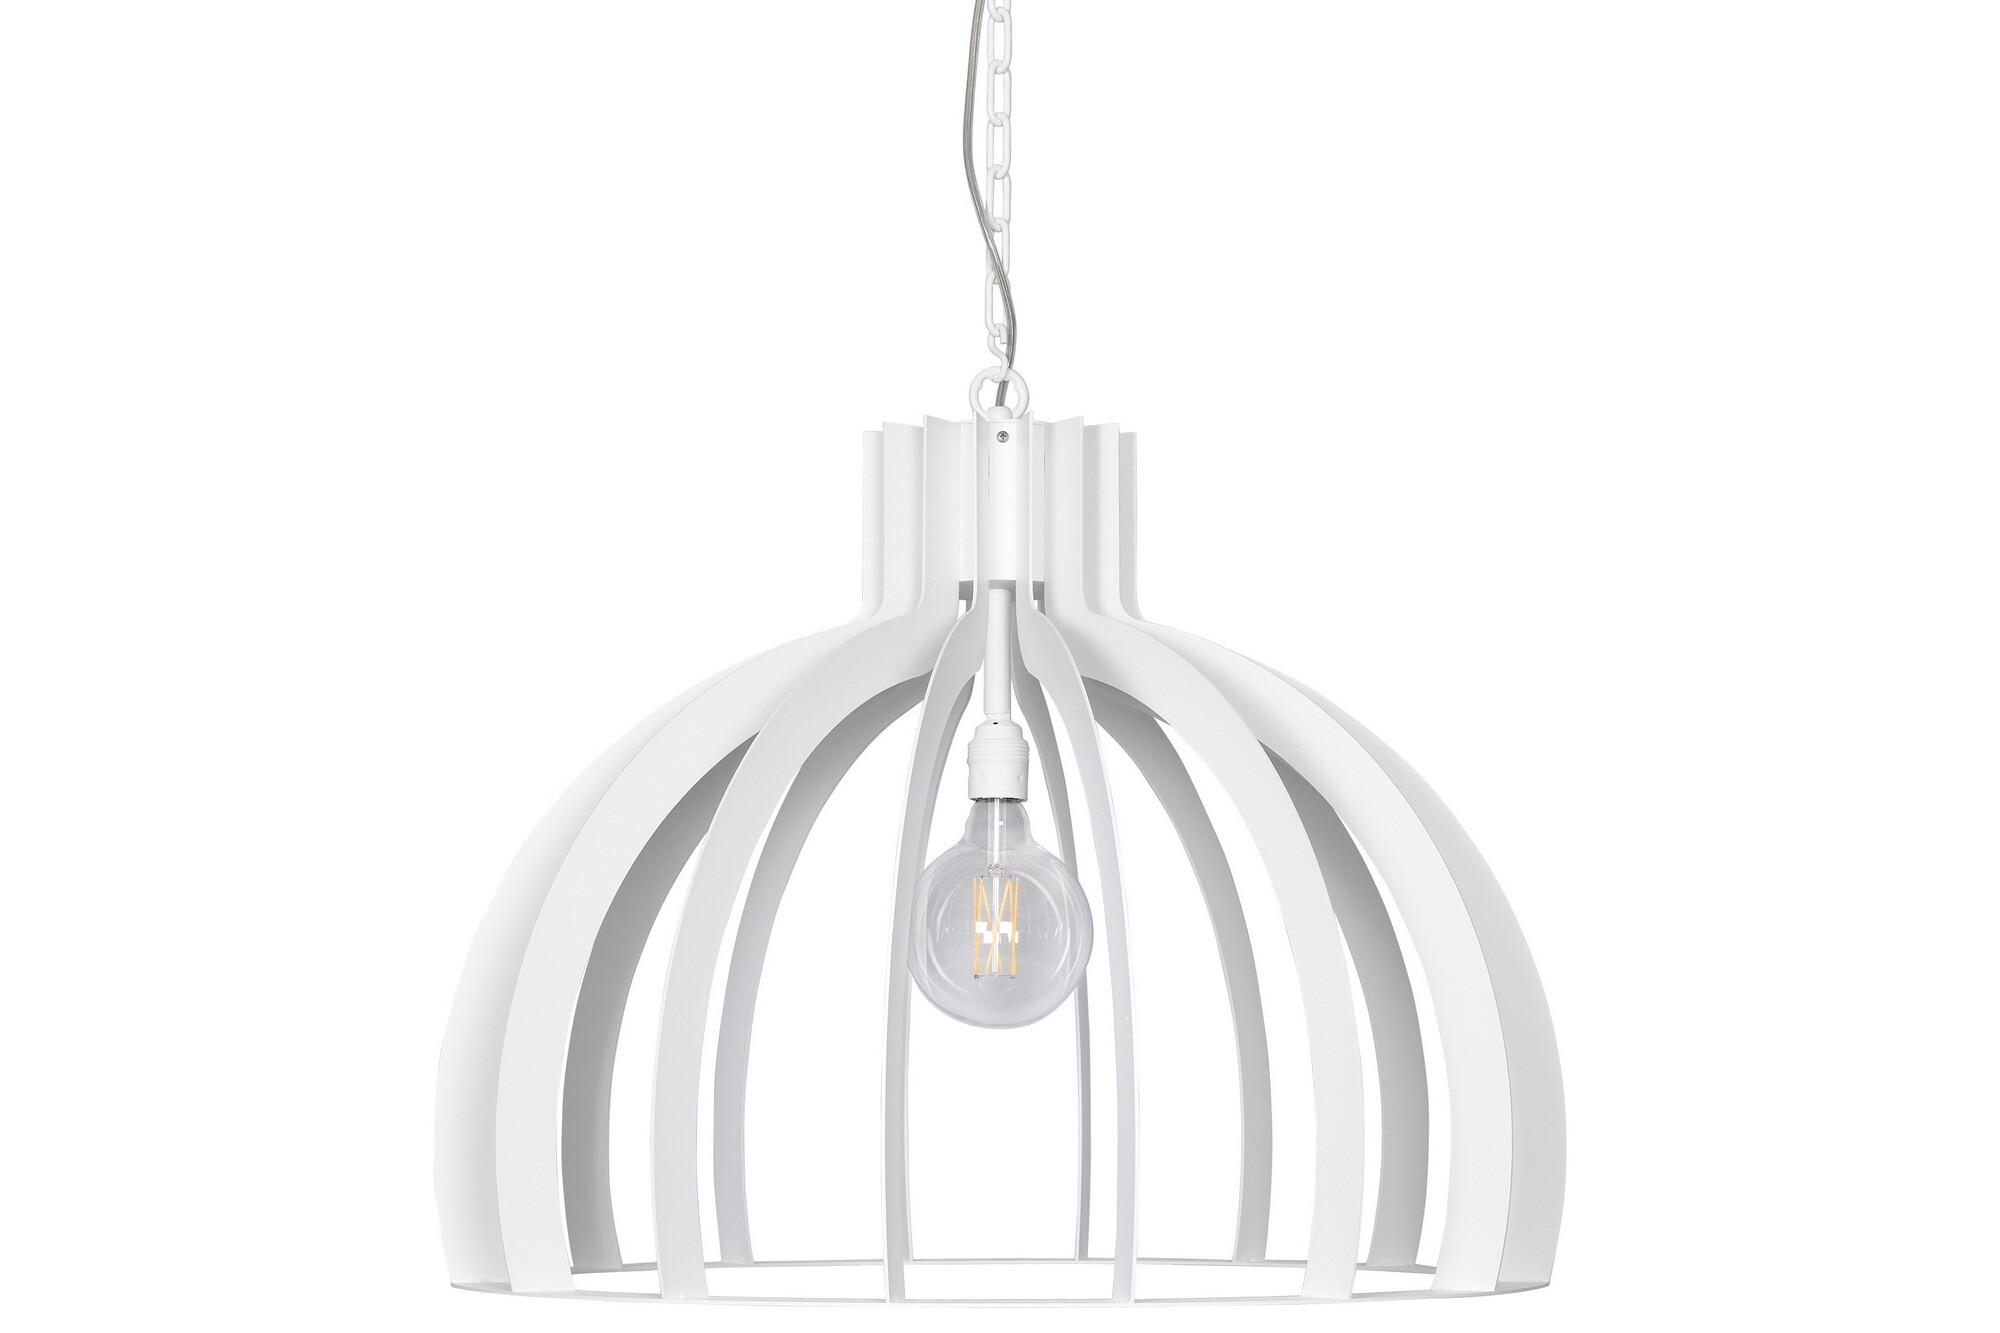 CATANIA Hanglamp E27 1x Wit